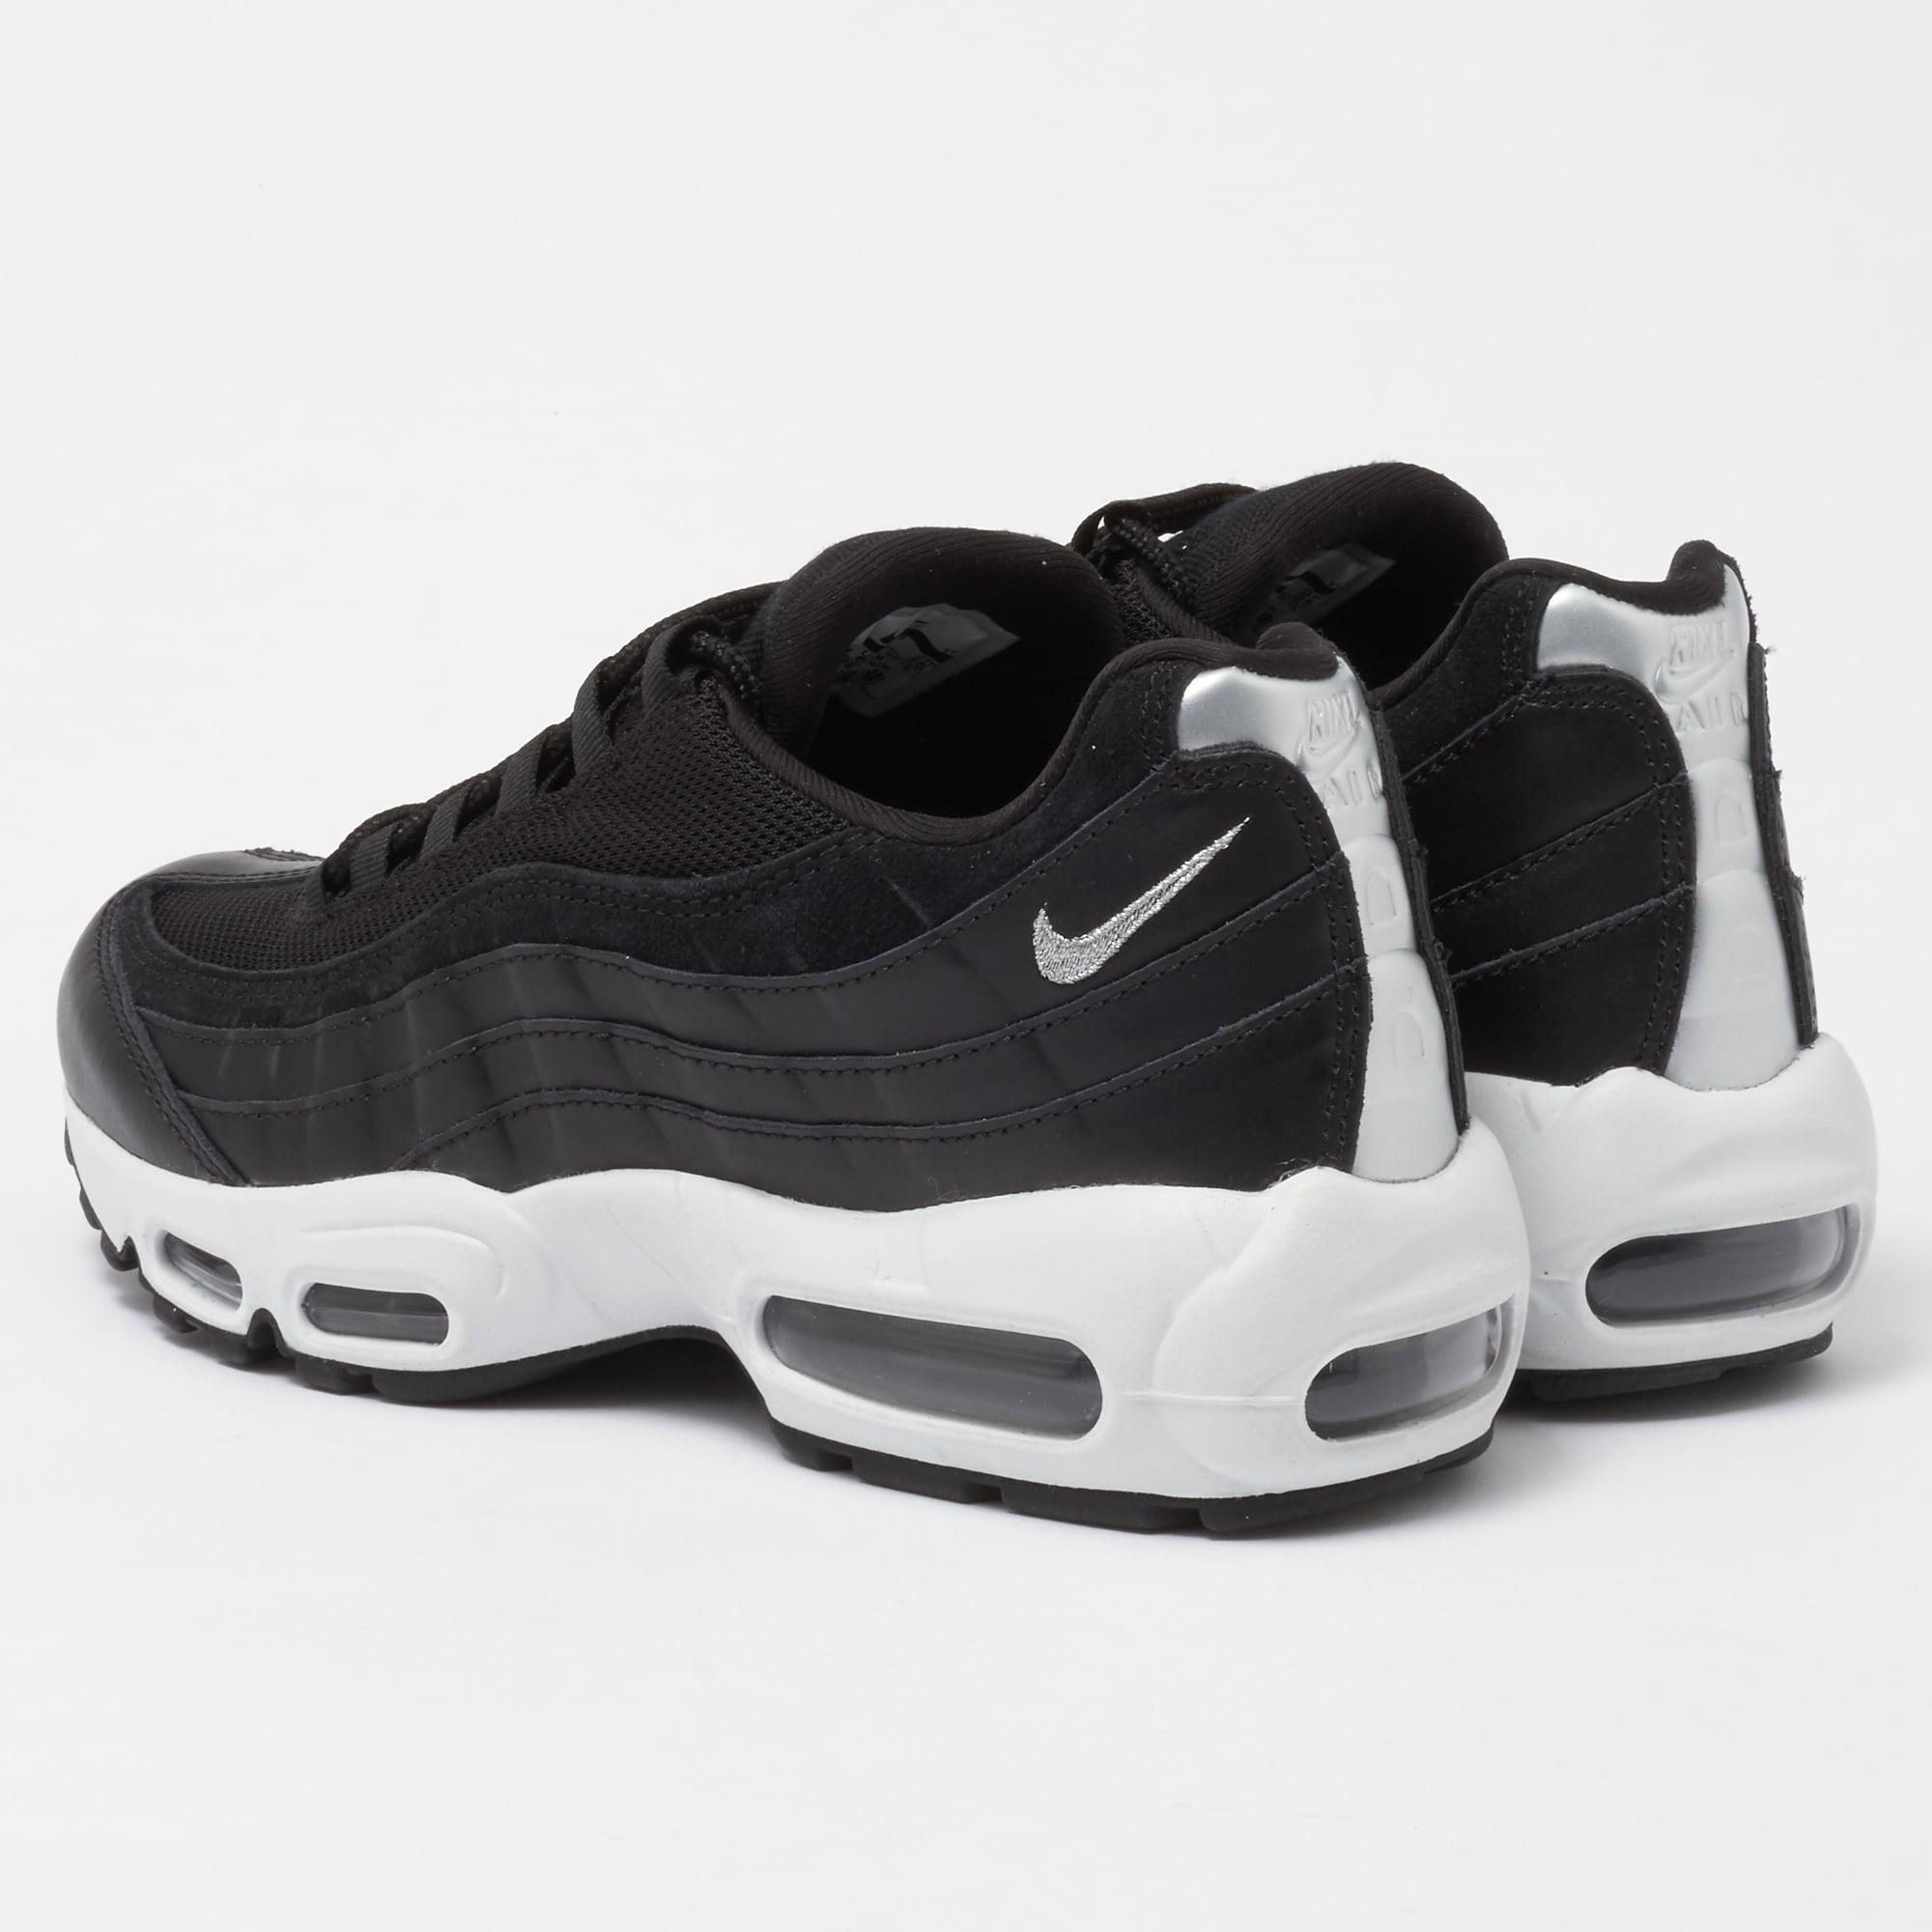 online retailer 5b177 d9f46 Nike Black Air Max 95